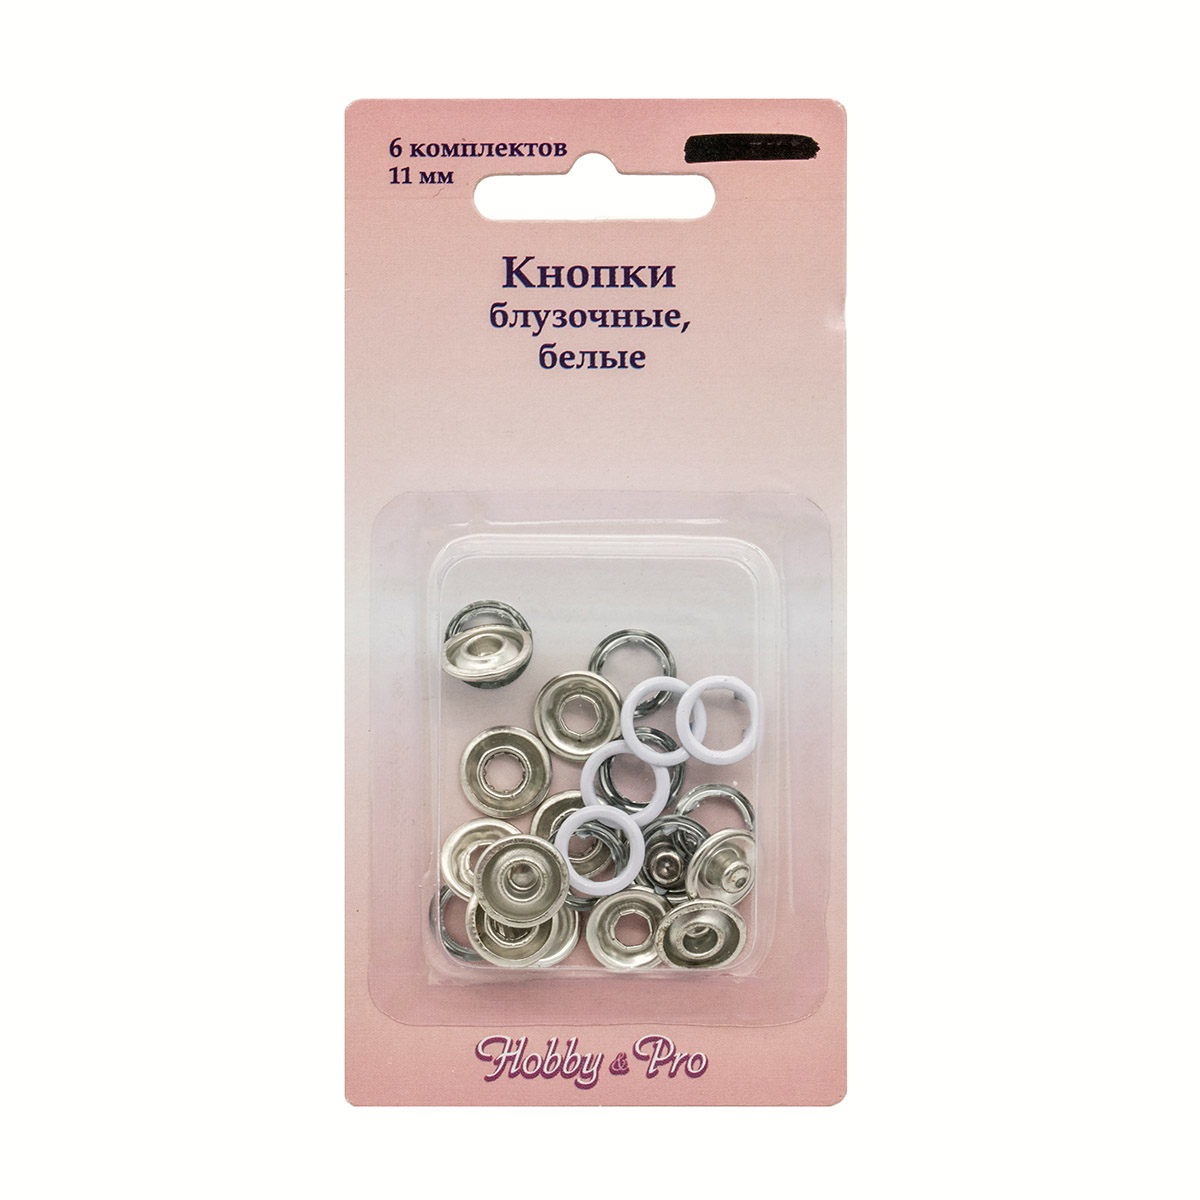 Кнопки для блузок 11мм, белые 521211, 6 шт., Hobby&Pro